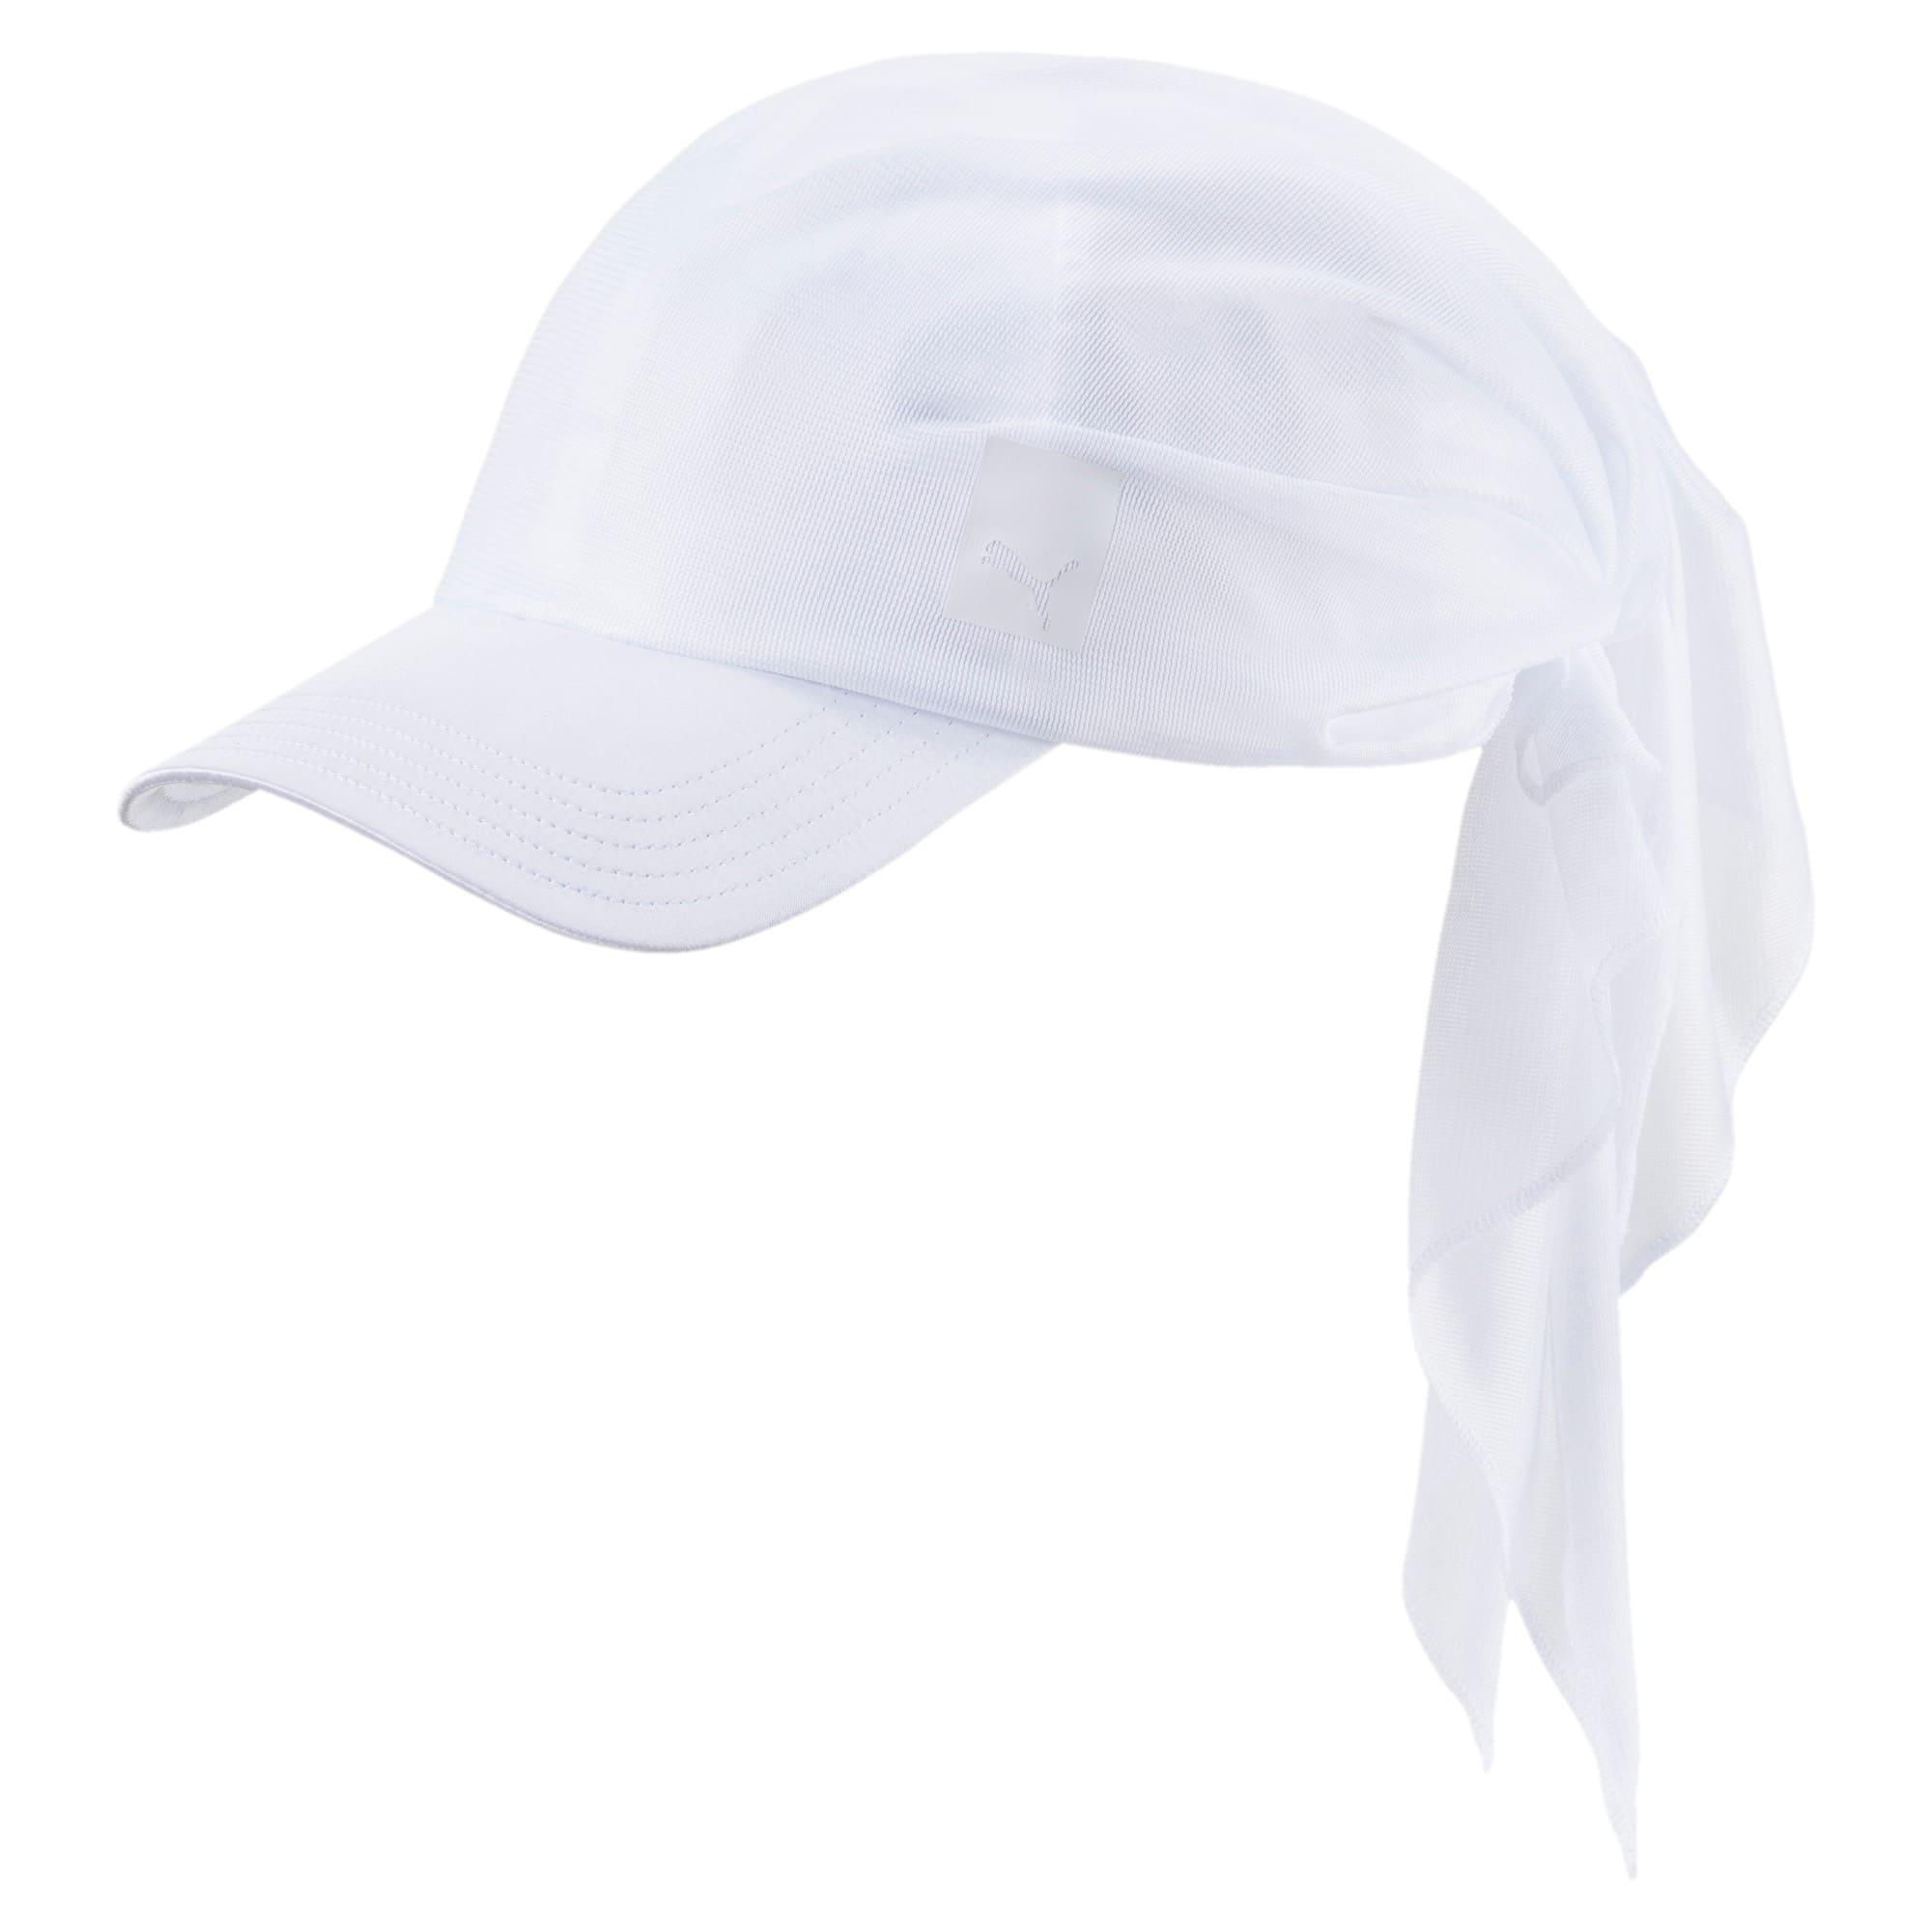 Thumbnail 1 of En Pointe Bandana Women's Hat, Puma White, medium